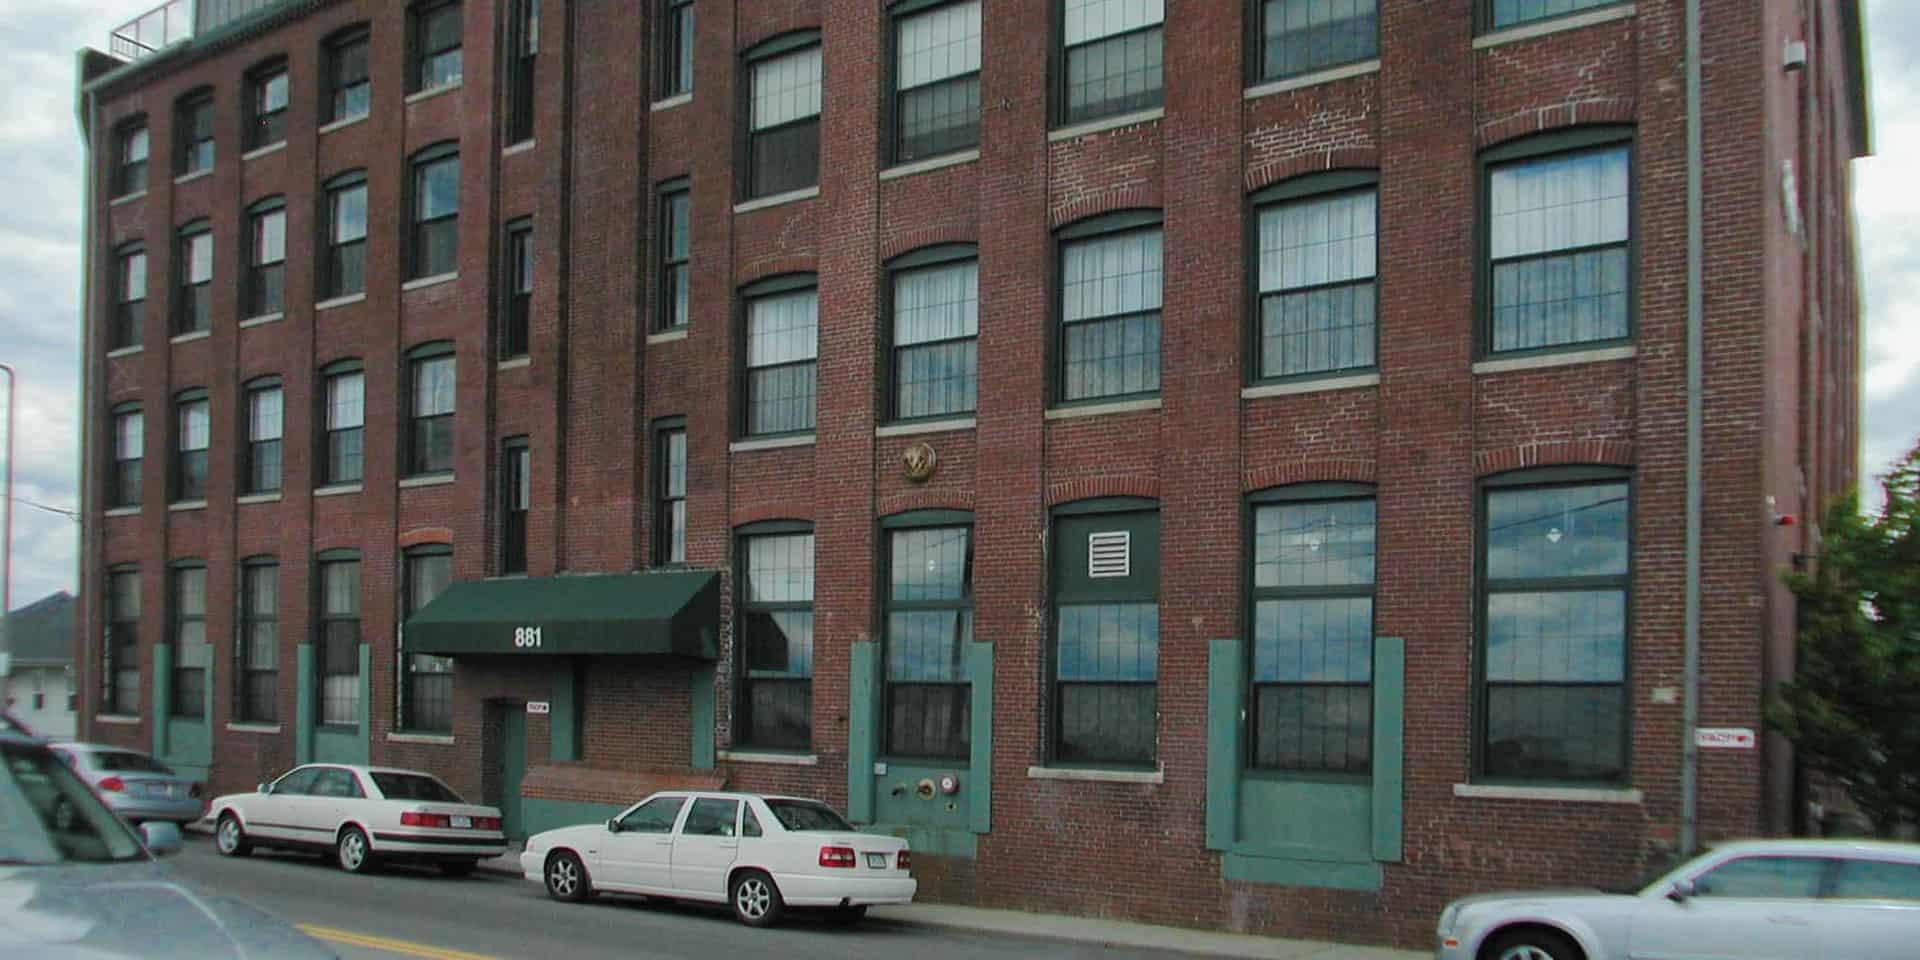 881 East First Street Lofts